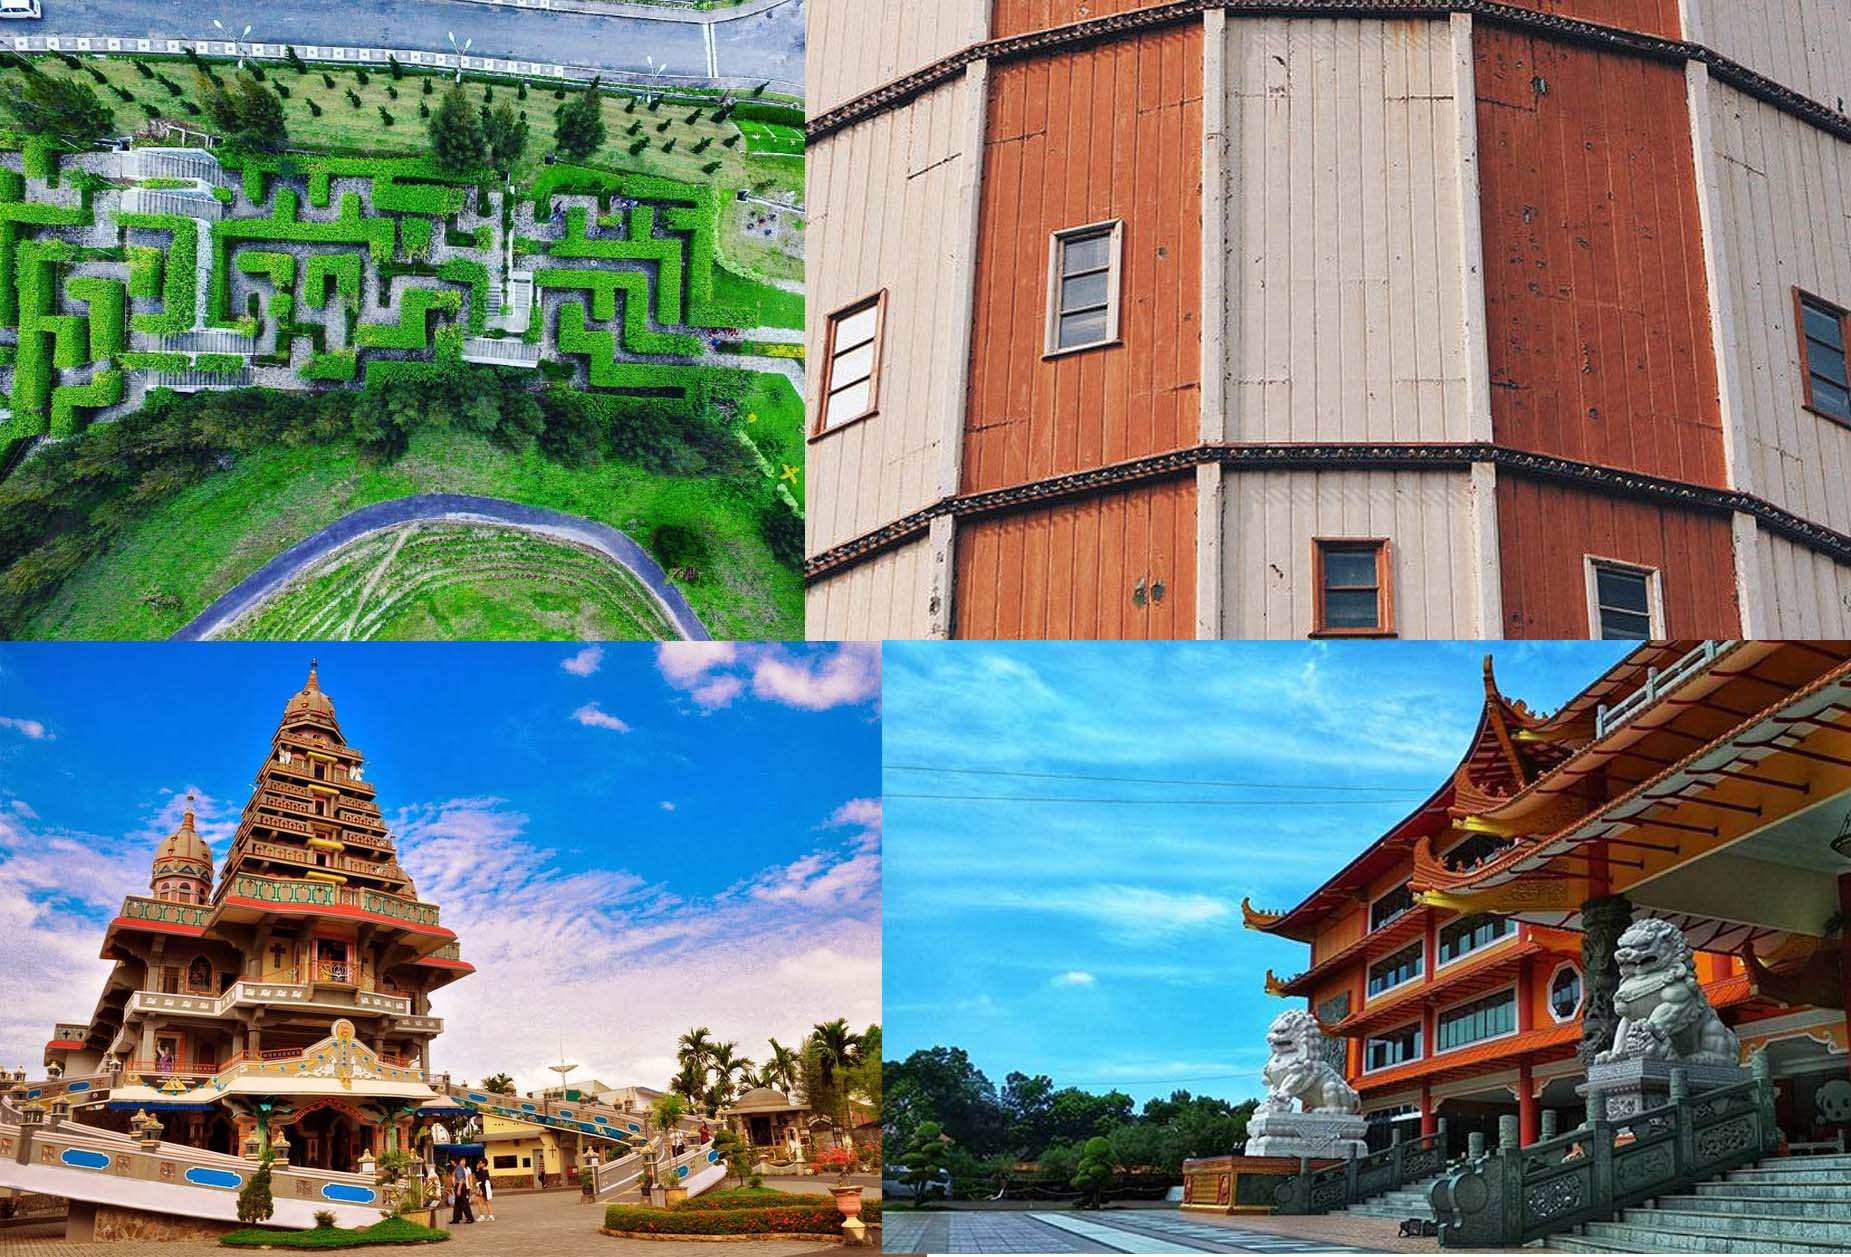 5 Tempat Wisata Paling Hits Di Kota Medan, No 4 Paling Sejuk !